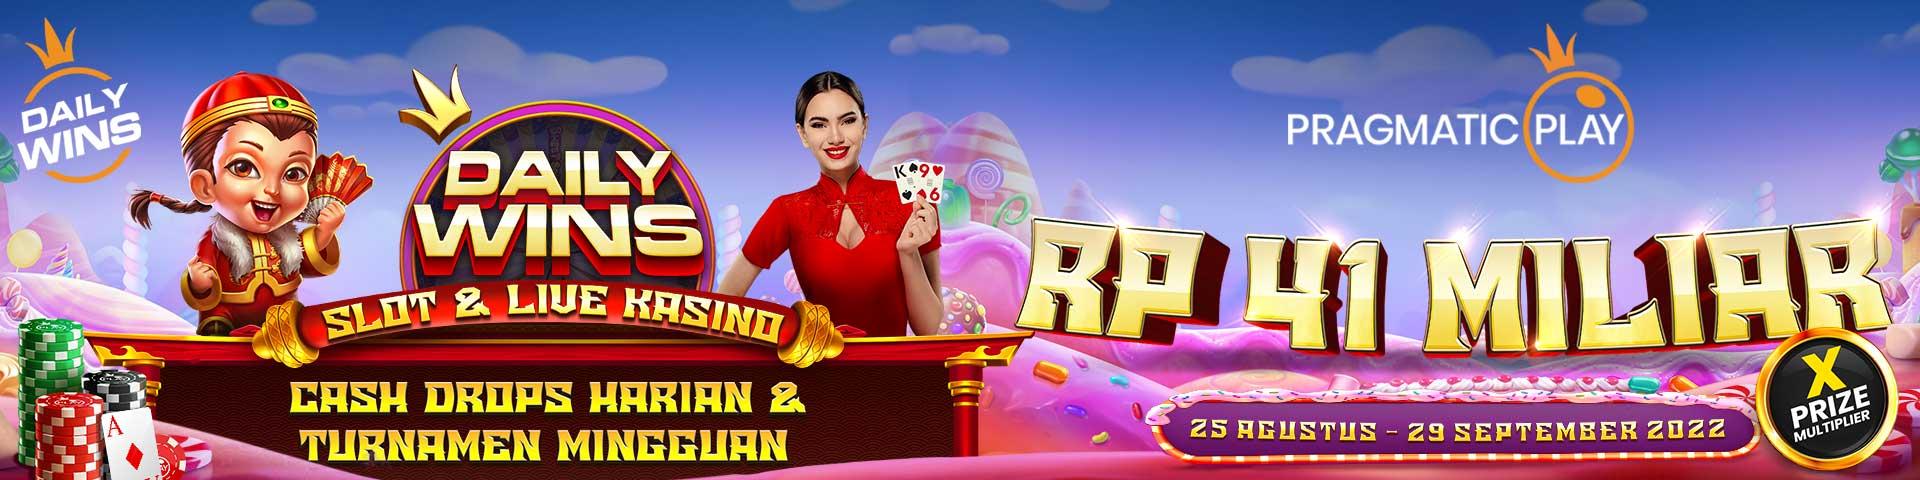 pragmaticplay memberikan bonus jackpot yang sangat menarik hingga 10.5 miliar rupiah bagi semua member setia game slot online